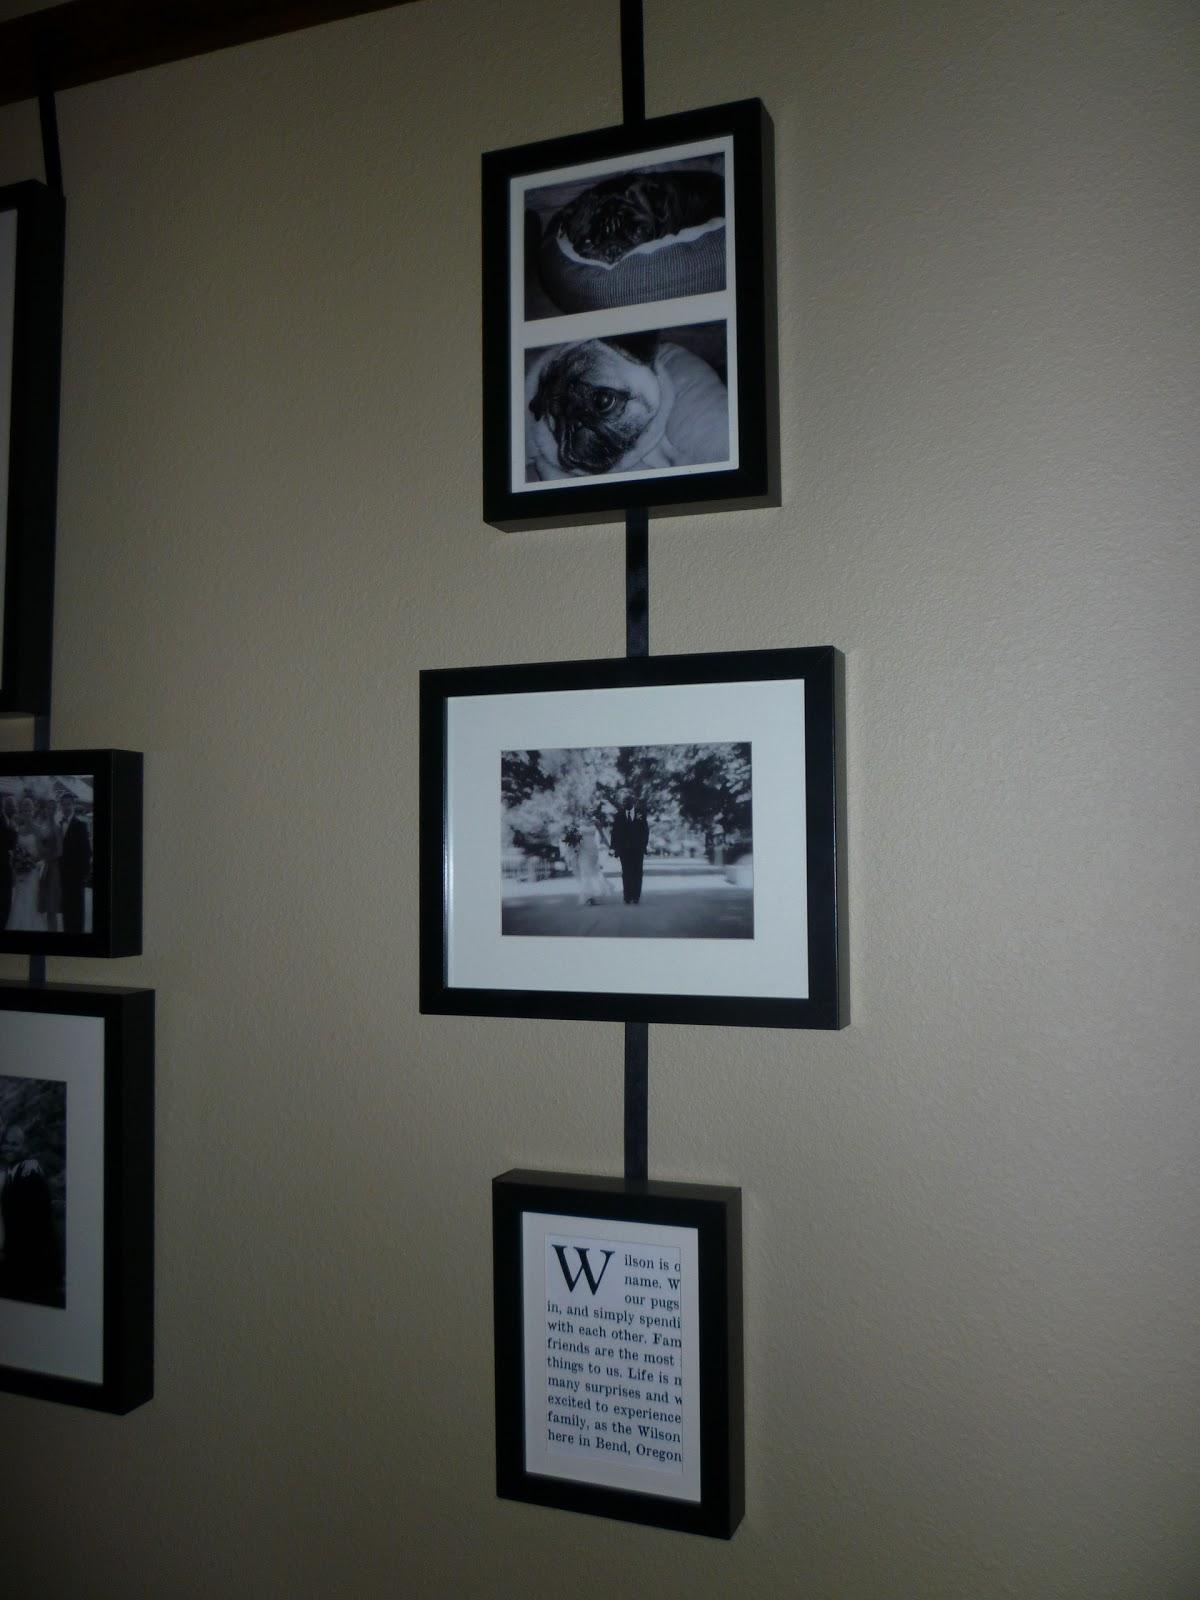 Studio Wall Easel Furniture Gallery